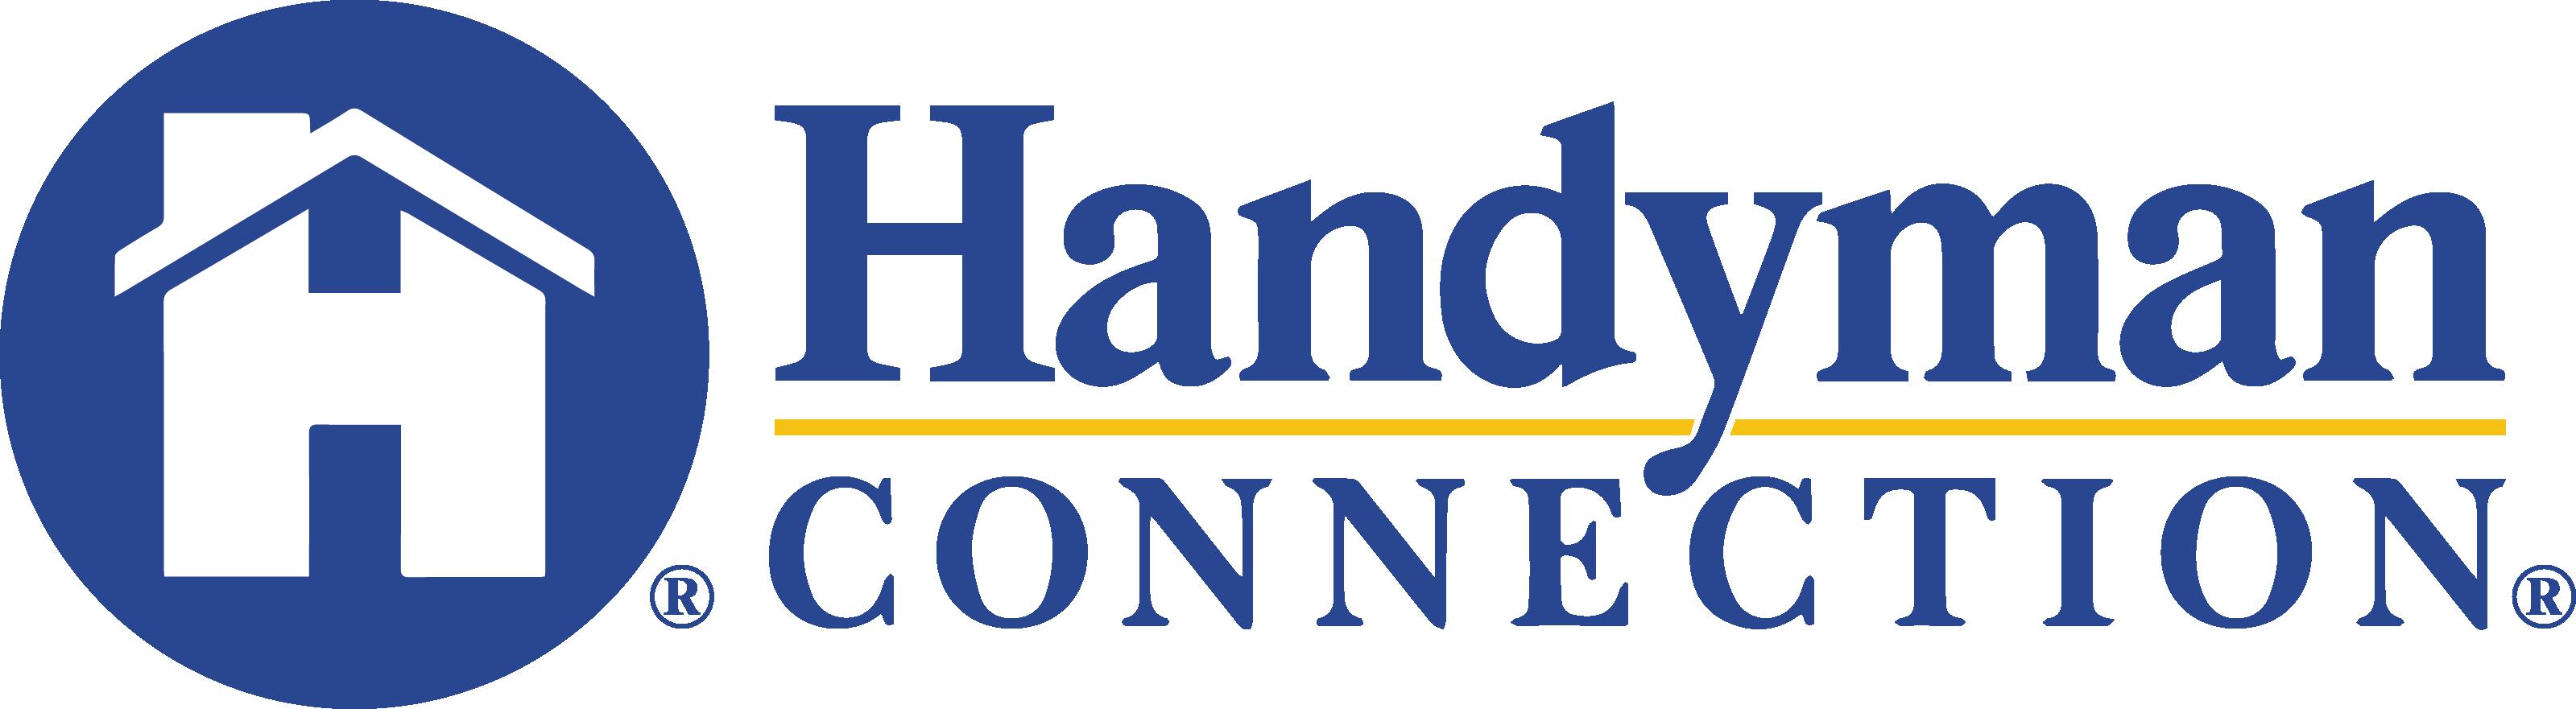 Handyman Connection of Edmonton, AB